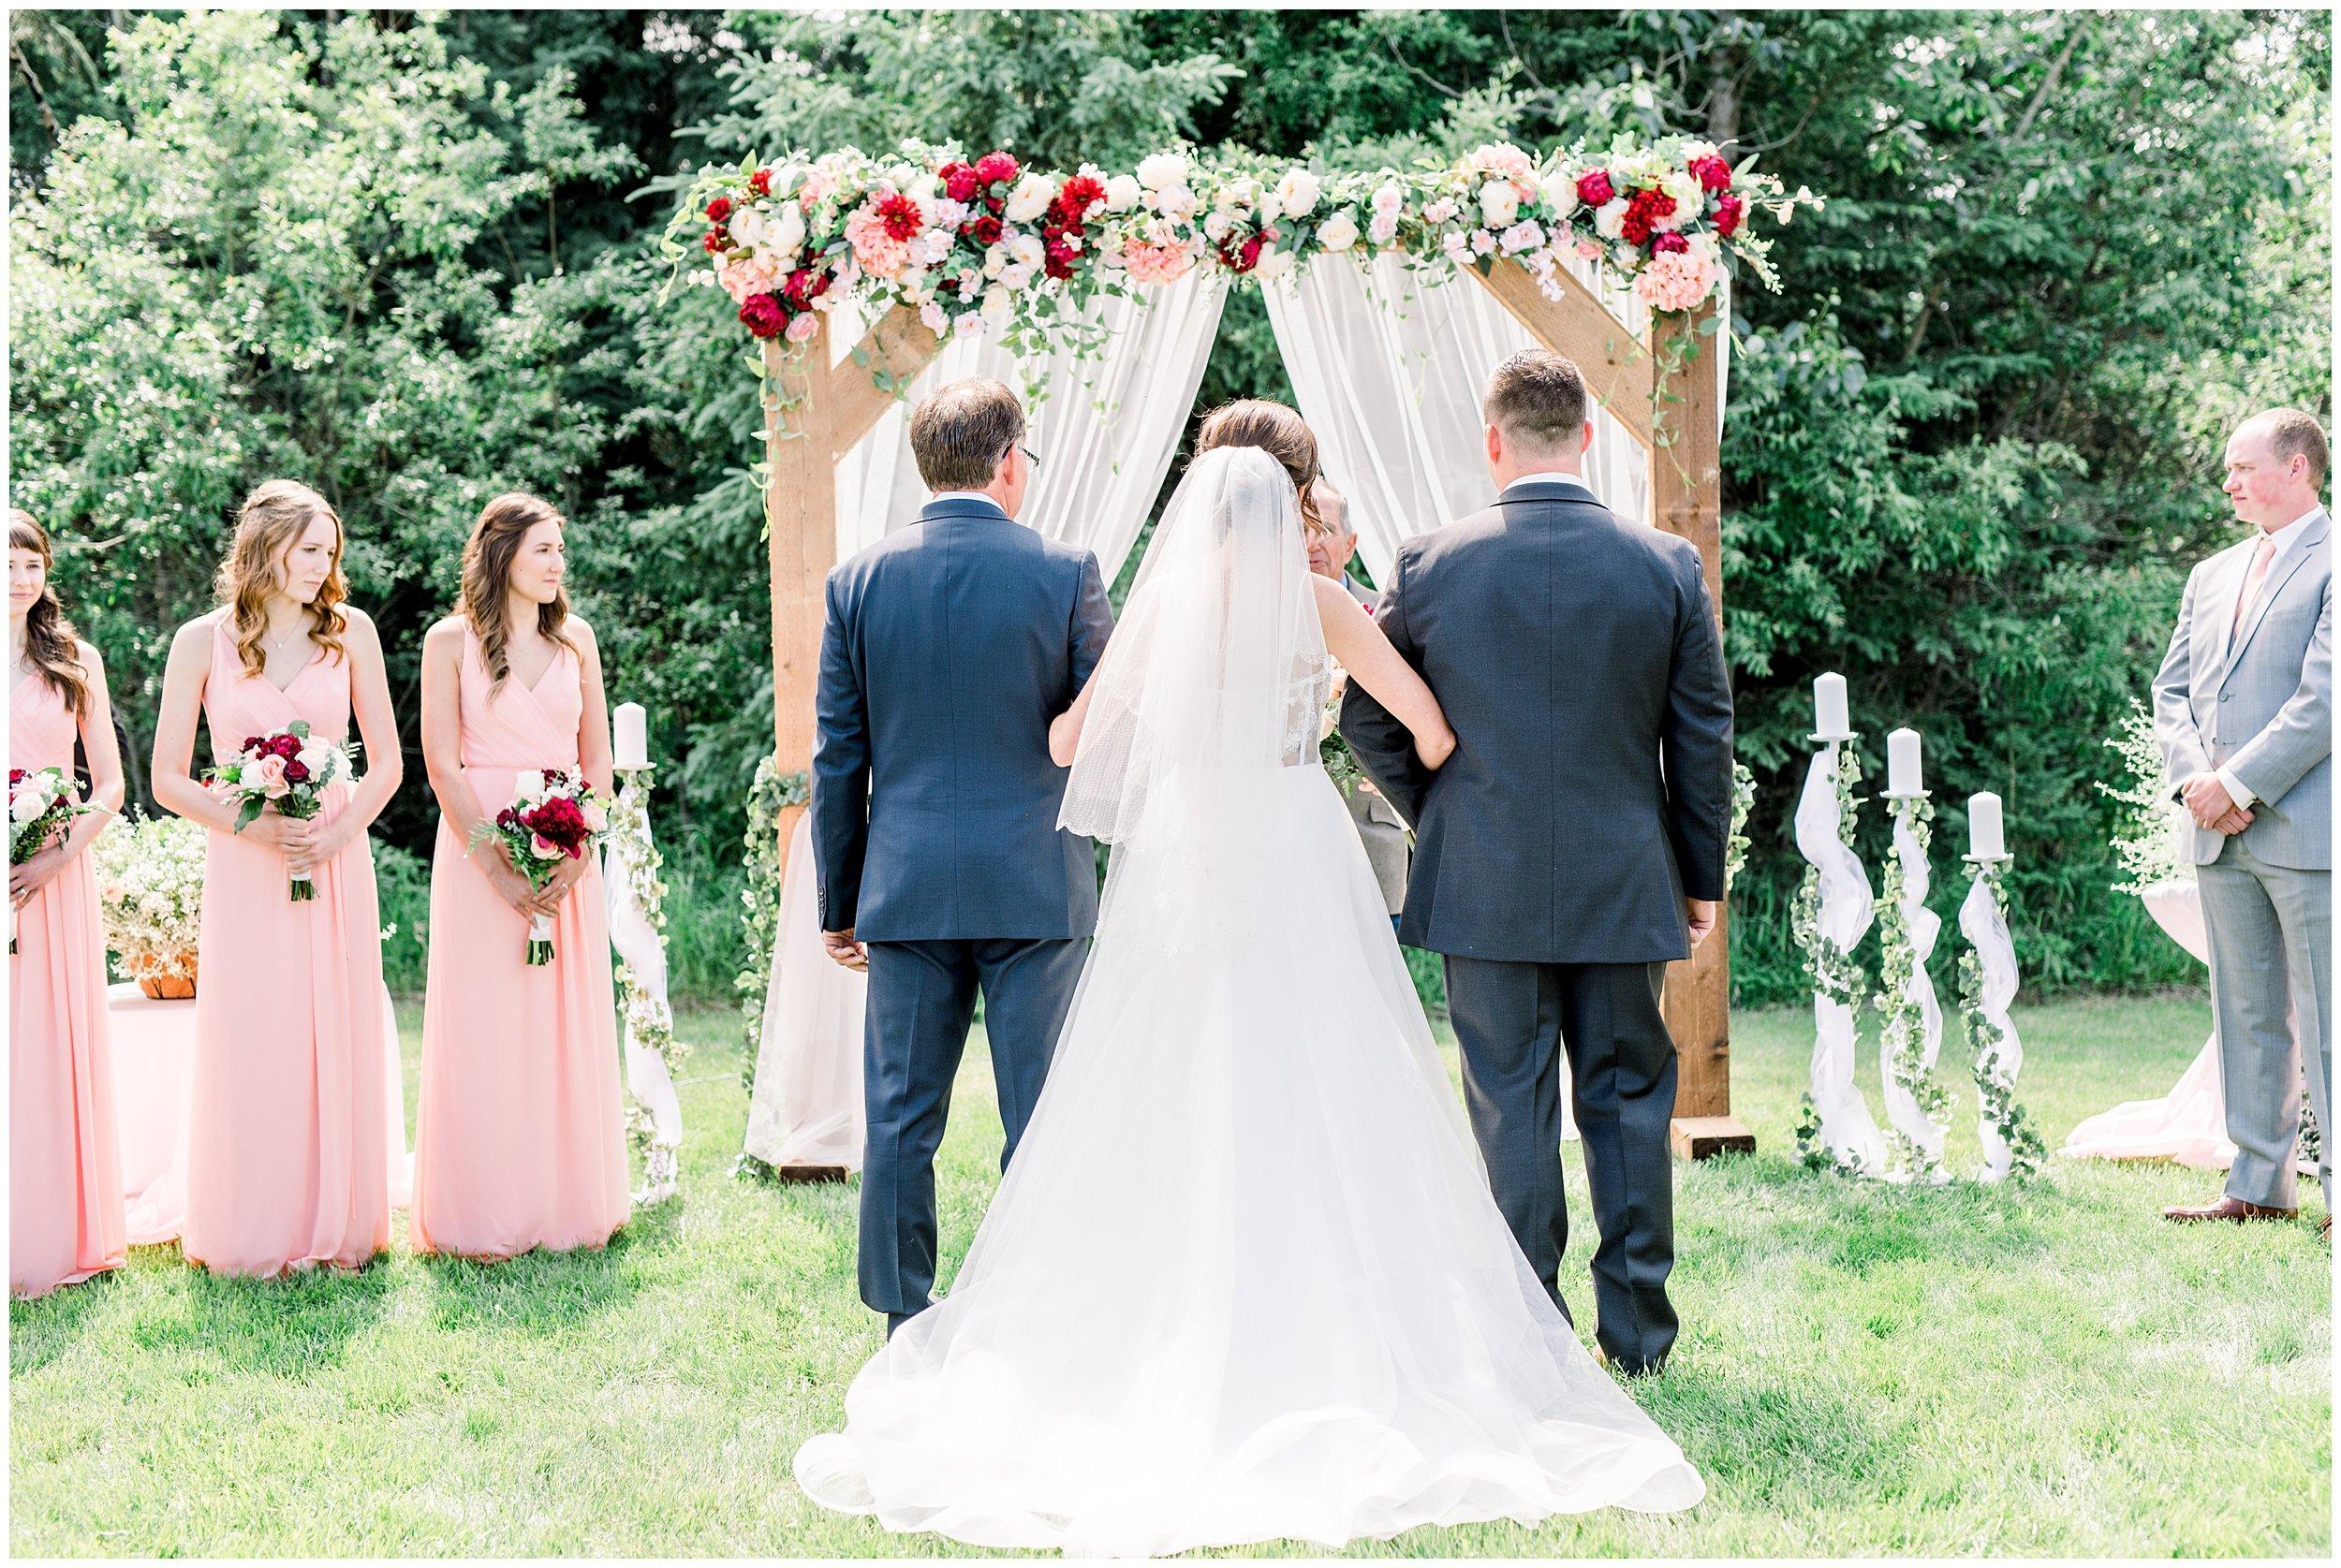 Alyssa-Poland-Photography_0610_alberta wedding.jpg